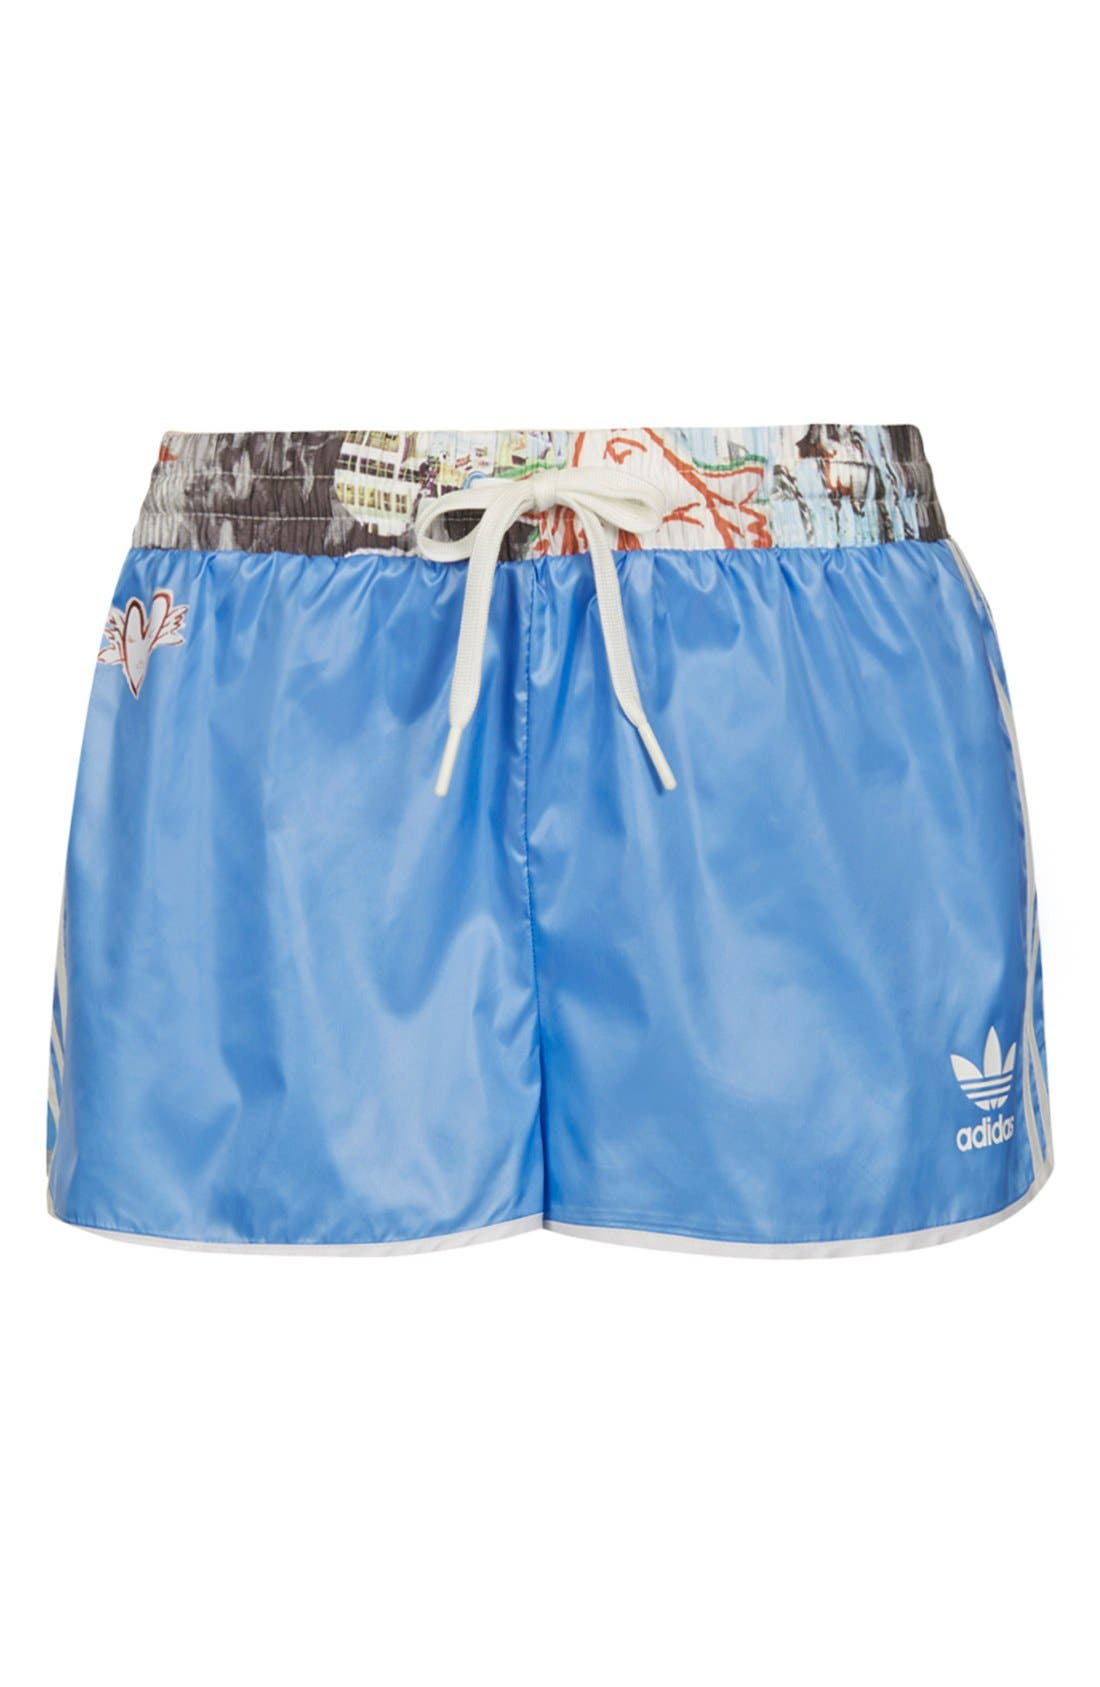 Alternate Image 3  - Topshop x adidas Originals Blue Shorts